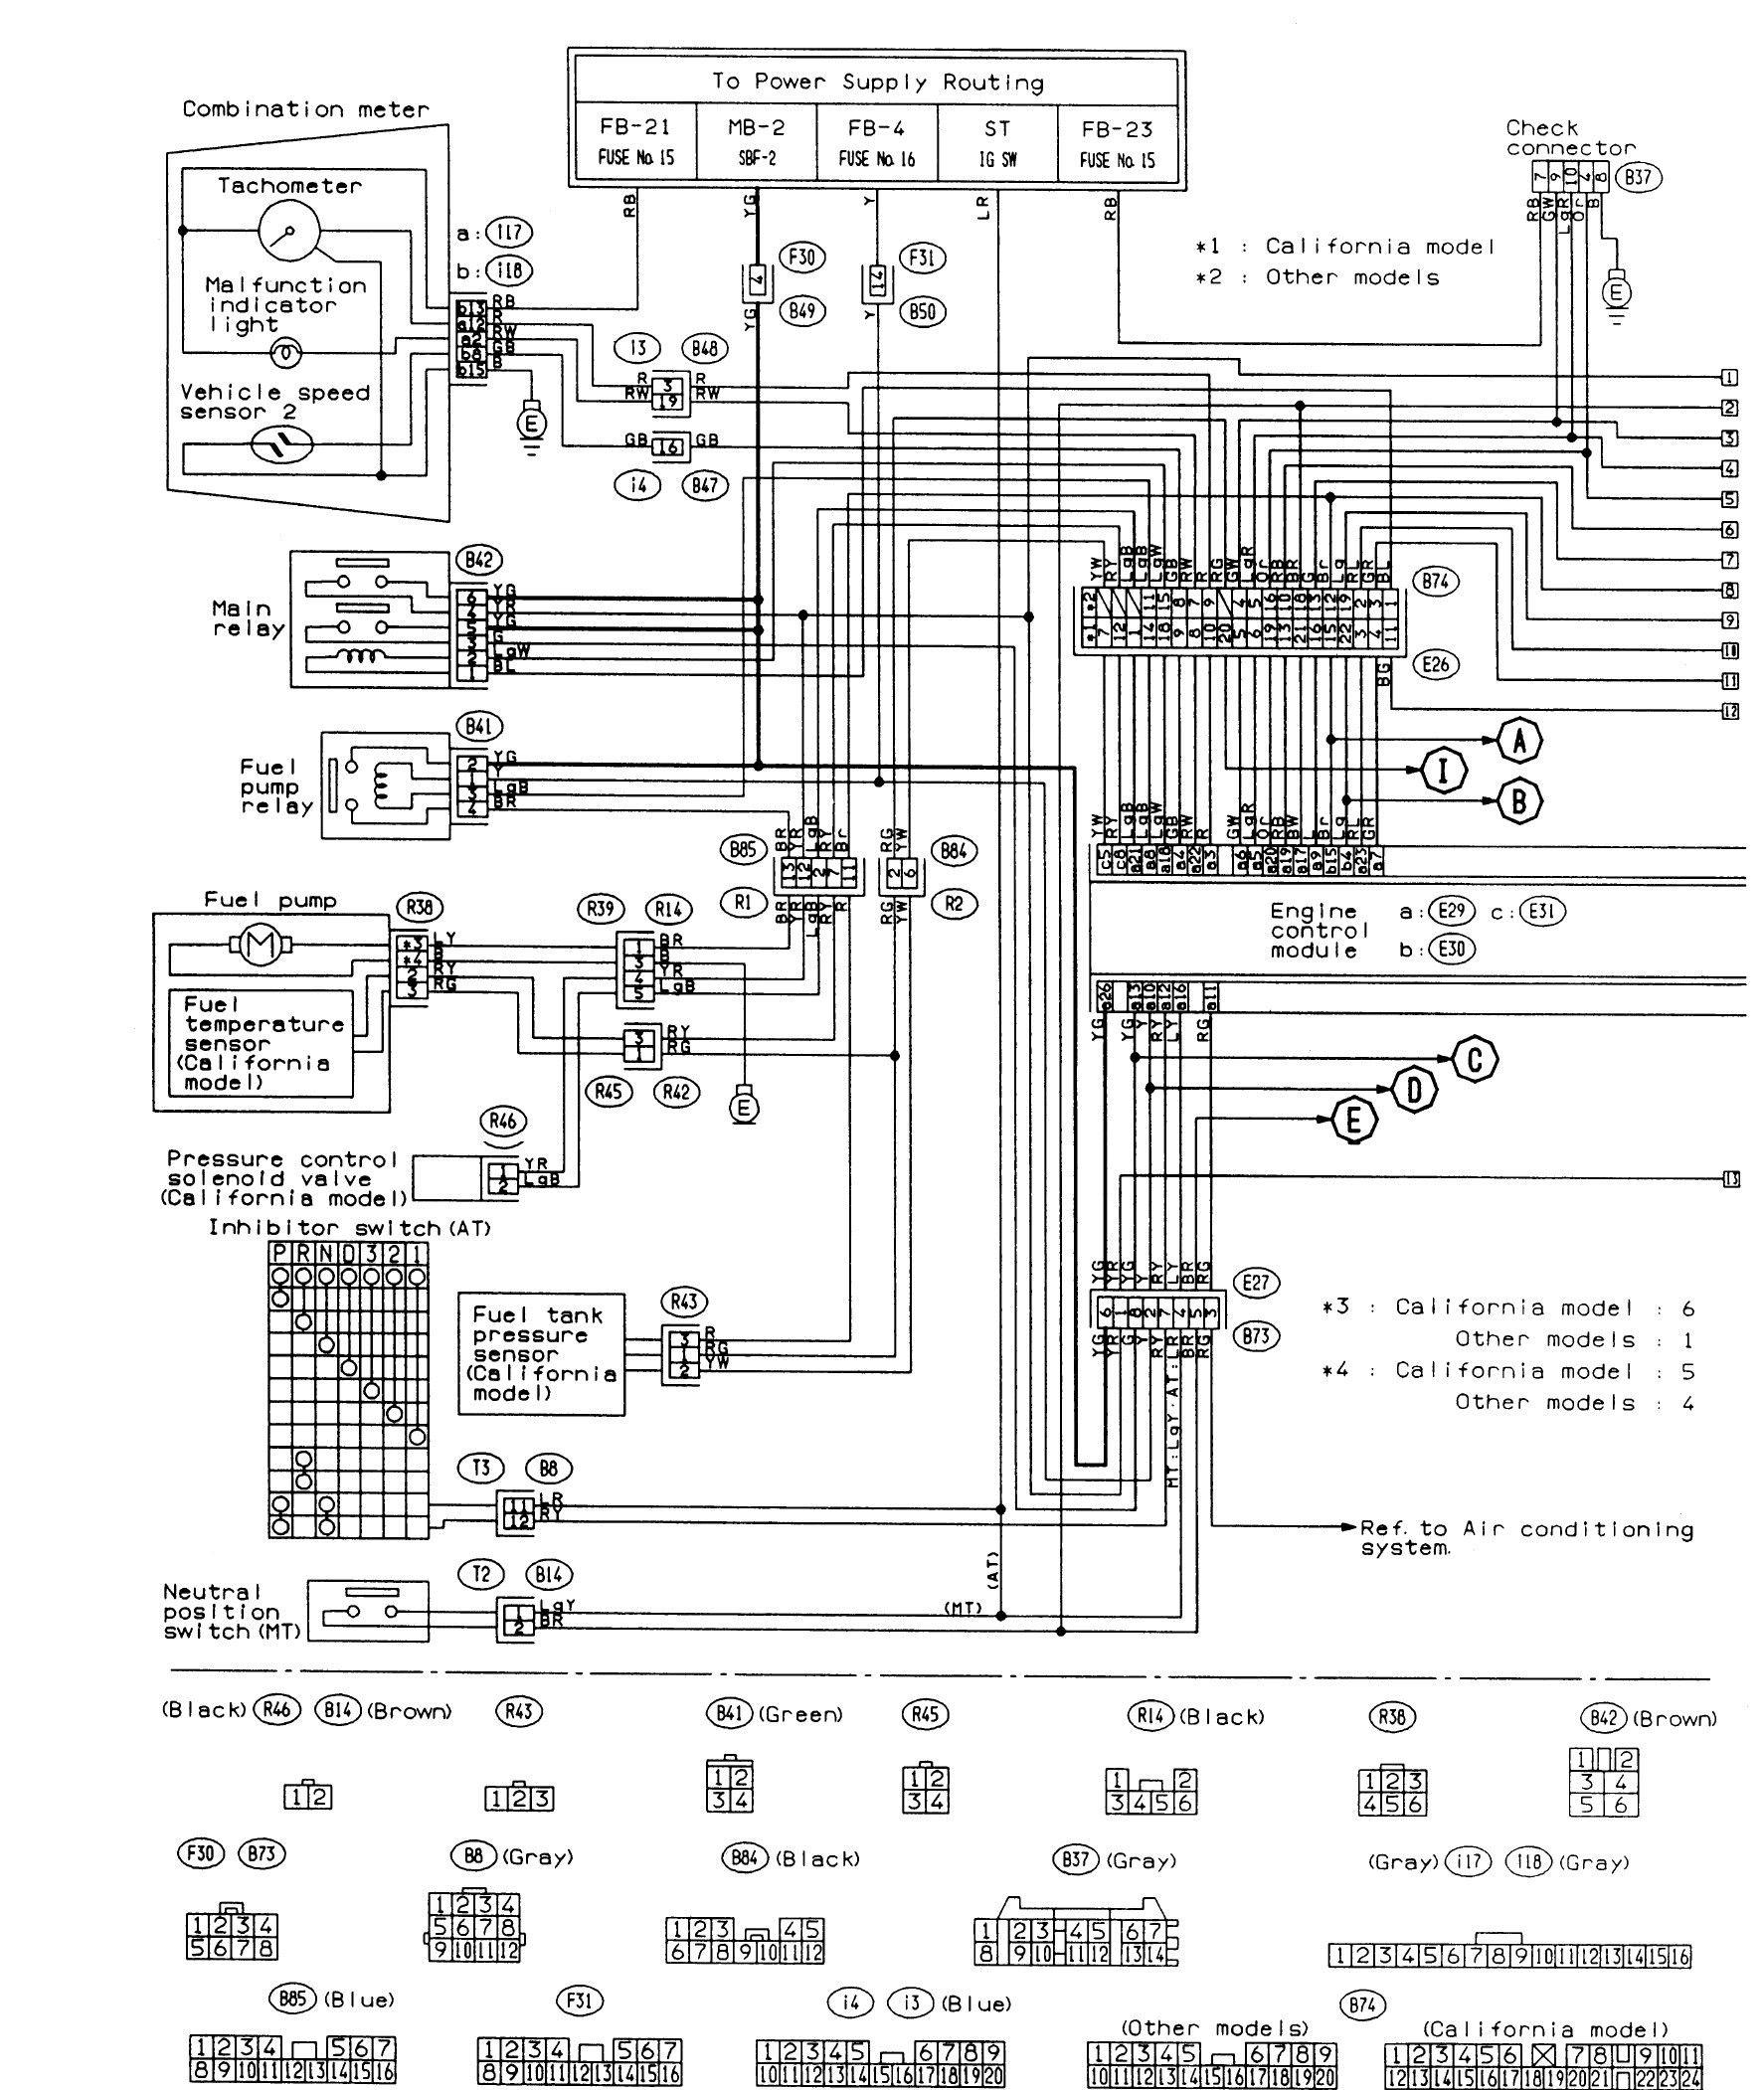 small resolution of subaru wiring diagram color codes